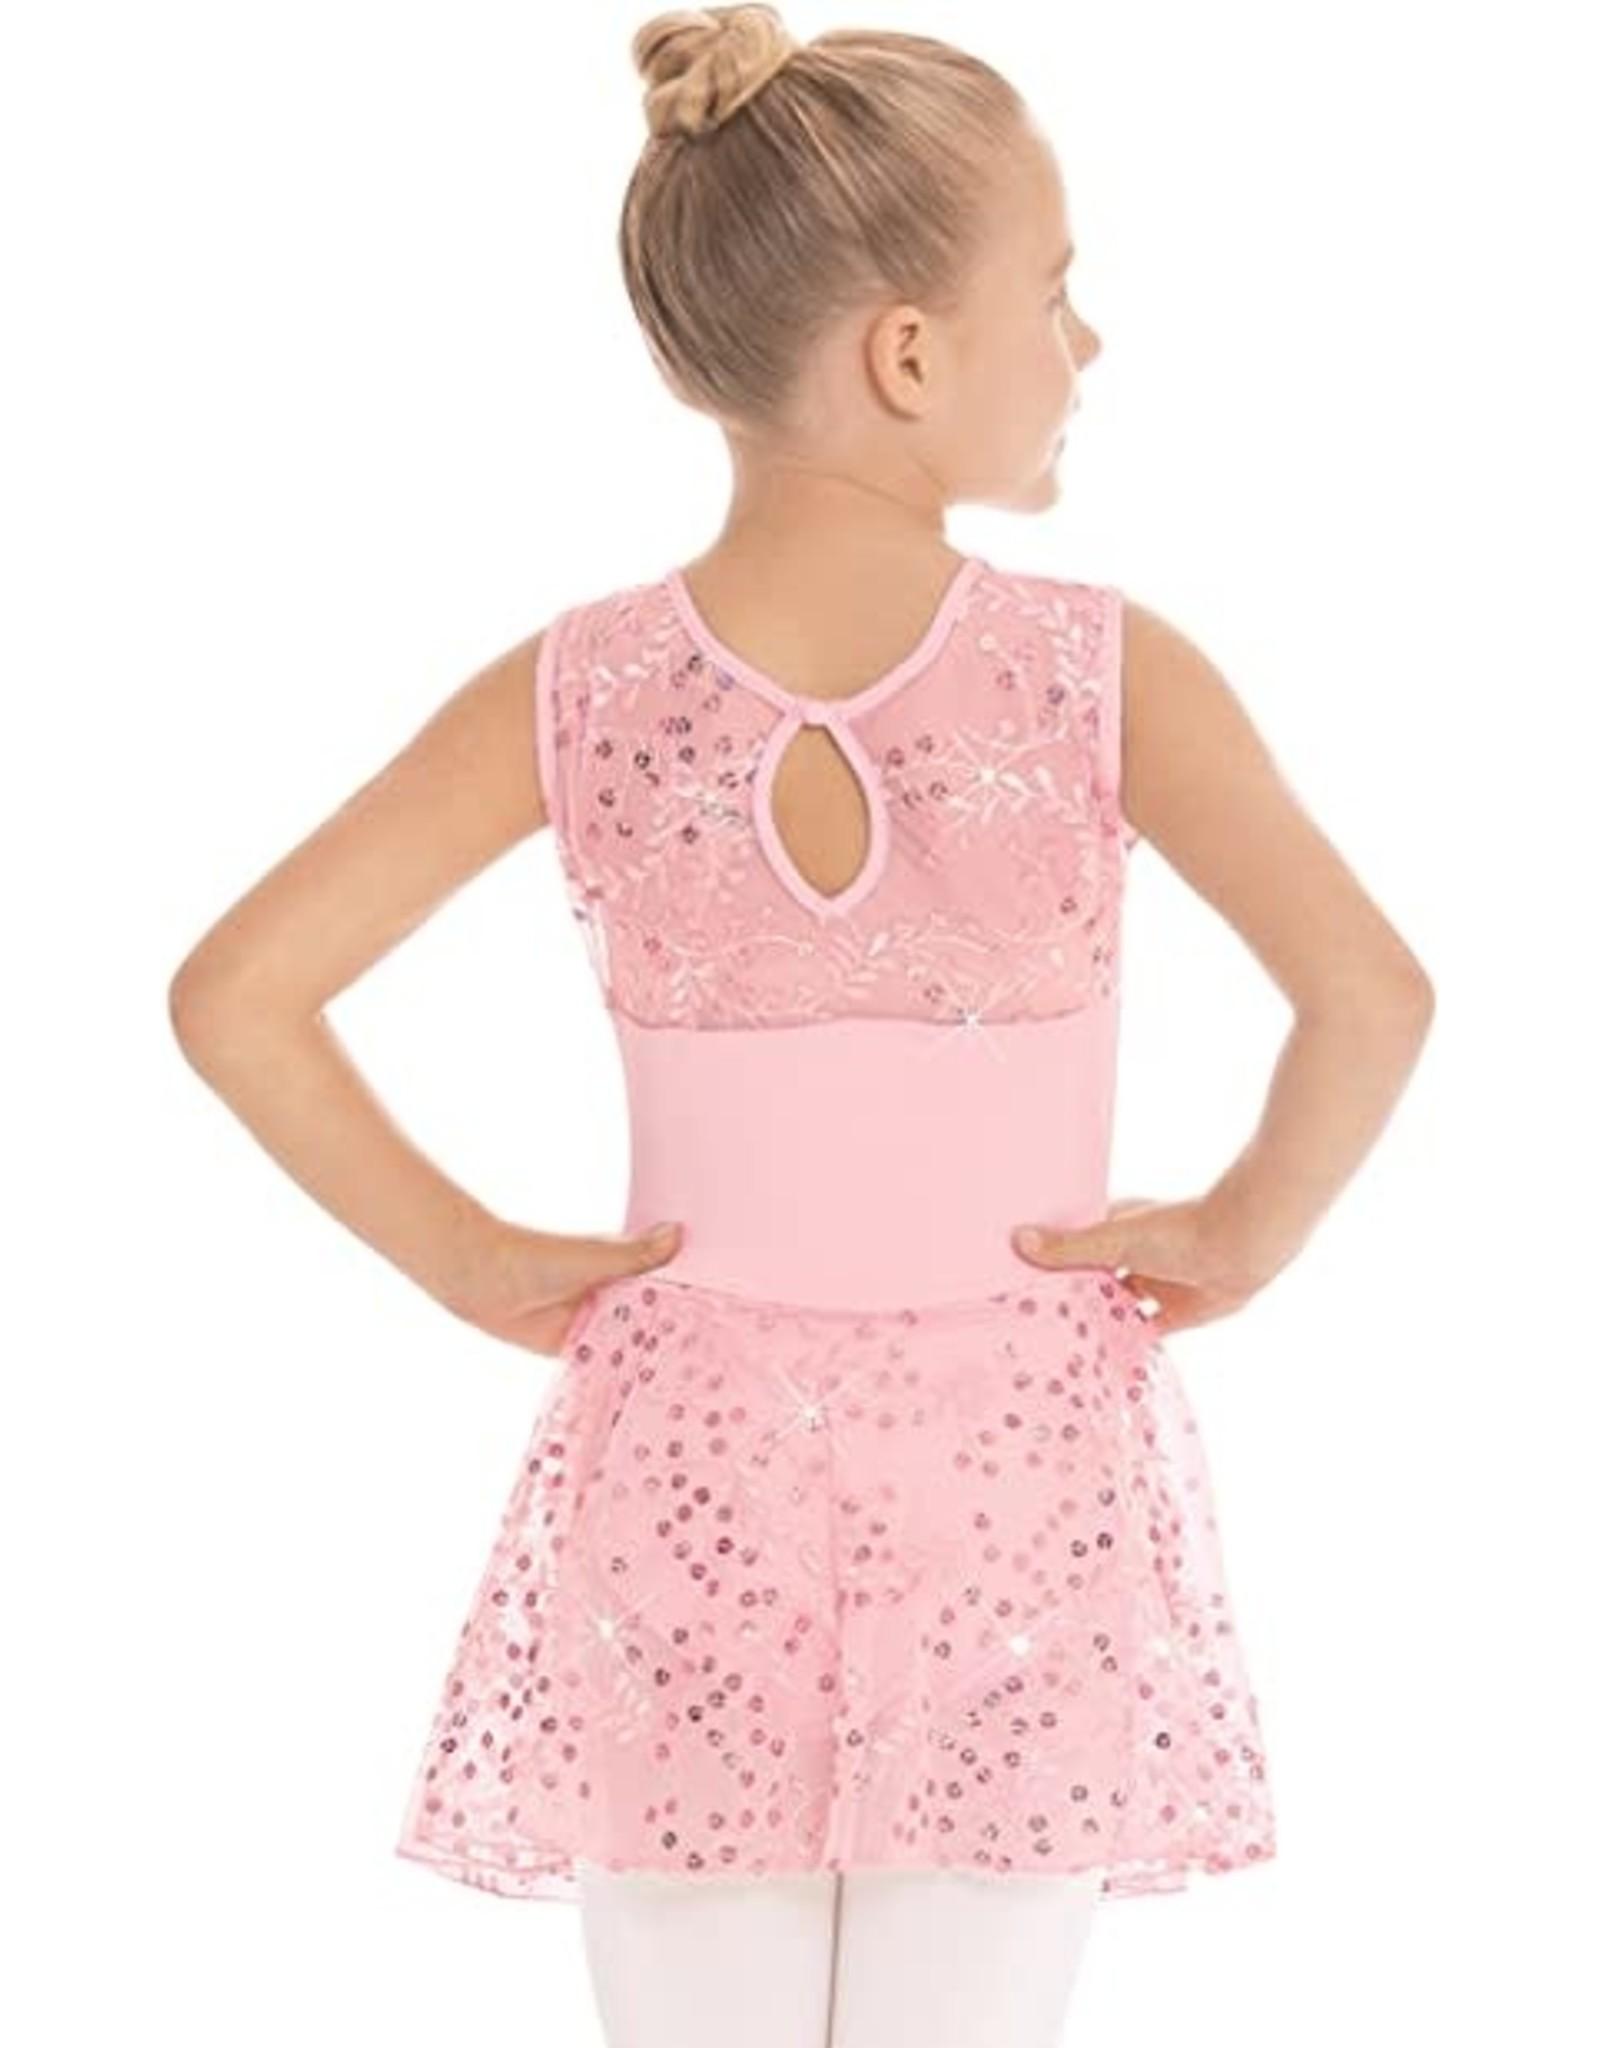 Eurotard Child Enchanted Dream Skirt